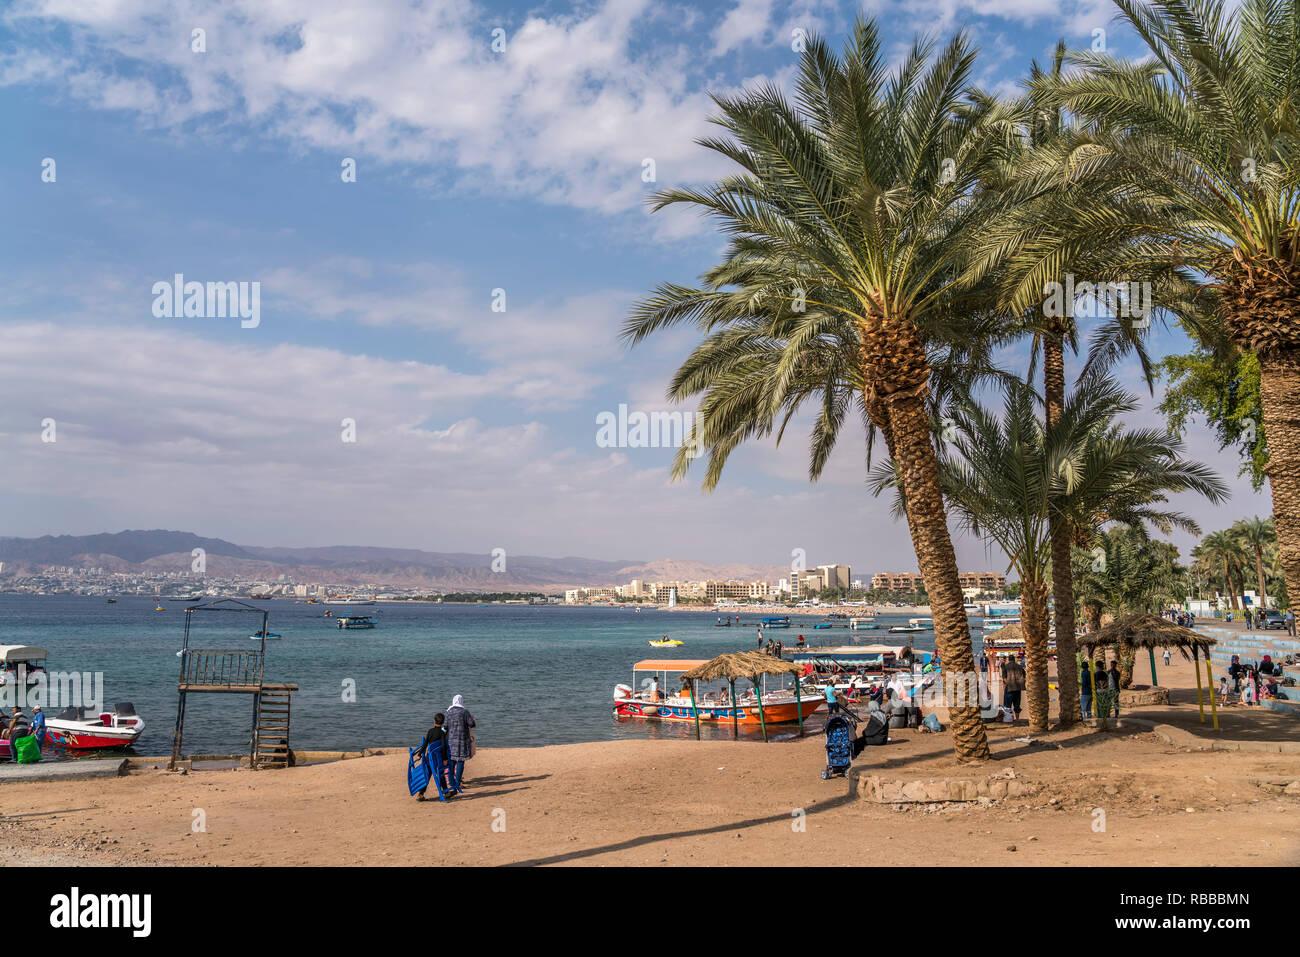 Glassbodenboote am öffentlichen Strand Al-Ghandour Beach. Akaba, Jordanien, Asien | glass boats at the public beach  Al-Ghandour Beach, Aqaba, Jordan, - Stock Image